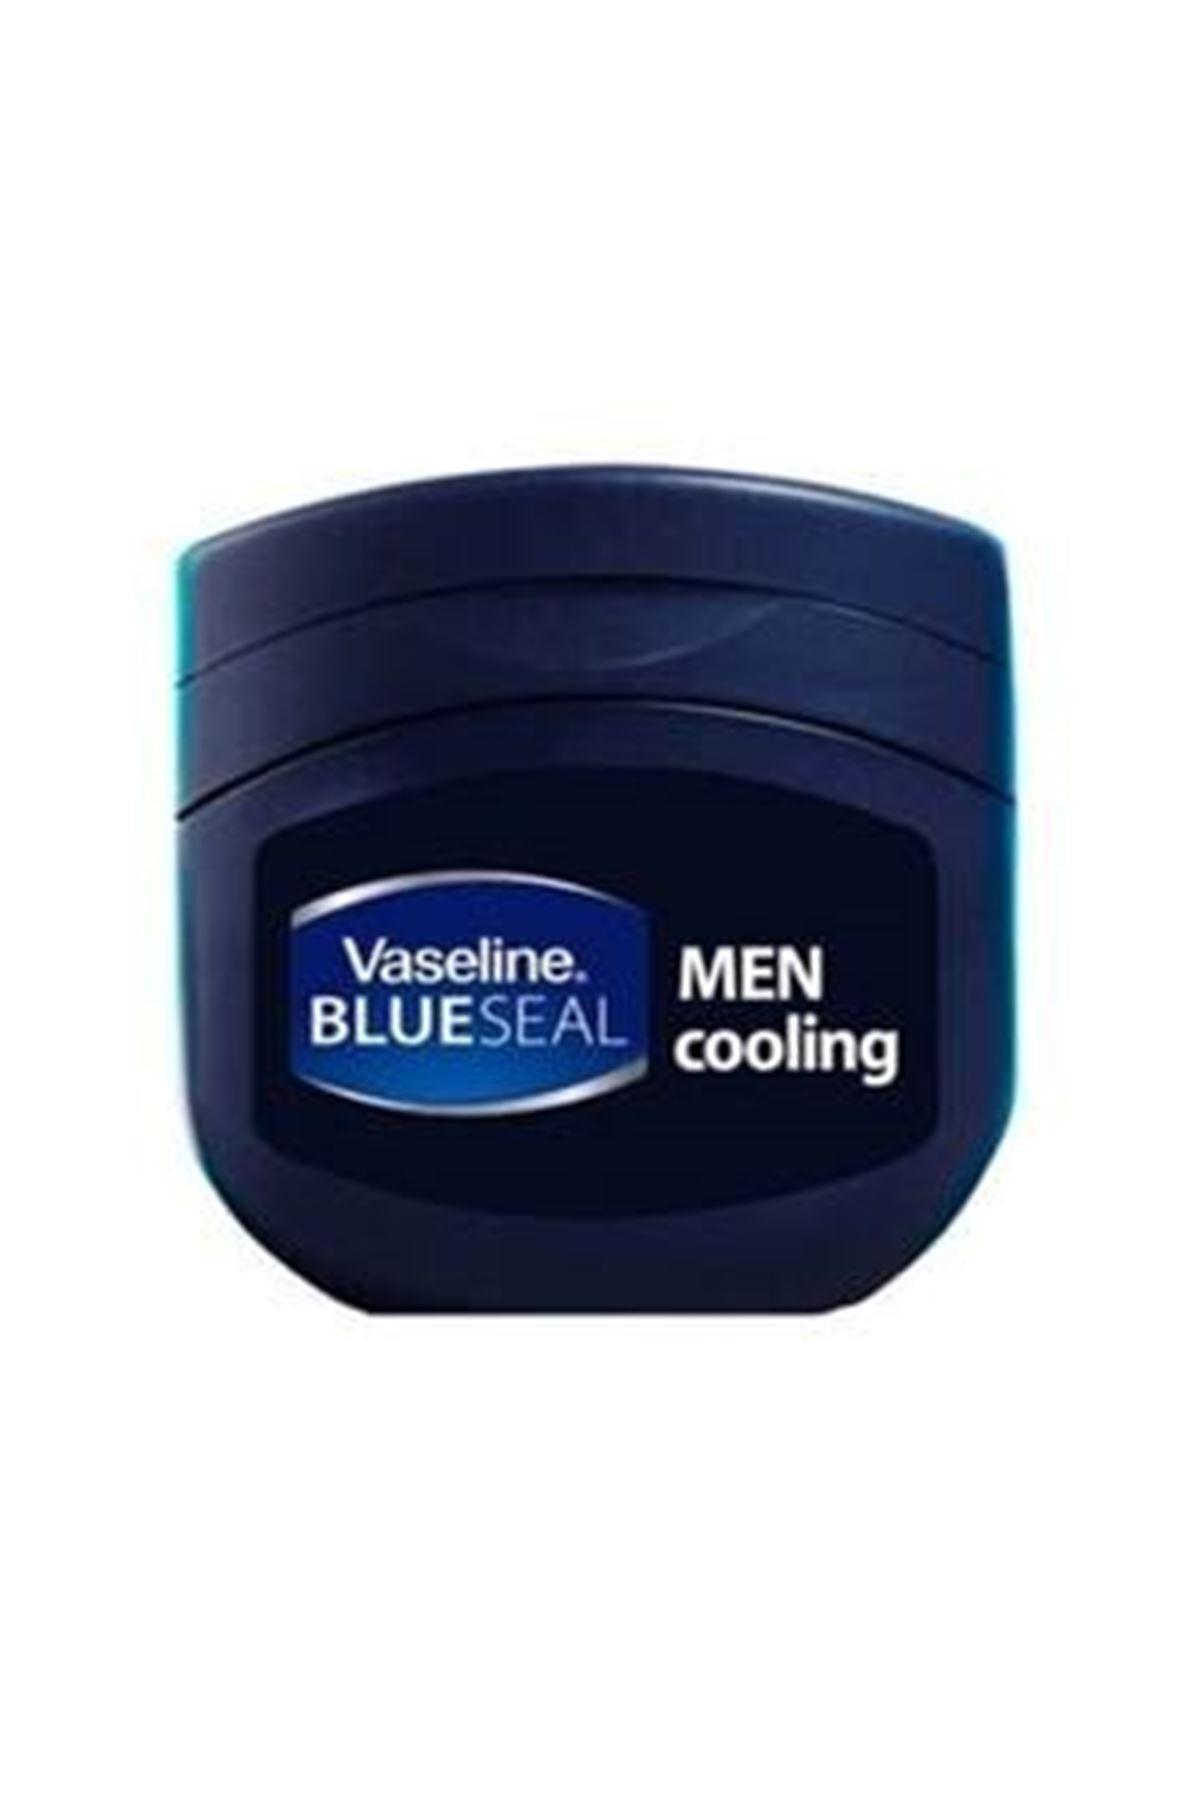 Vaseline Blueseal Men Cooling Jel Krem 100 ml